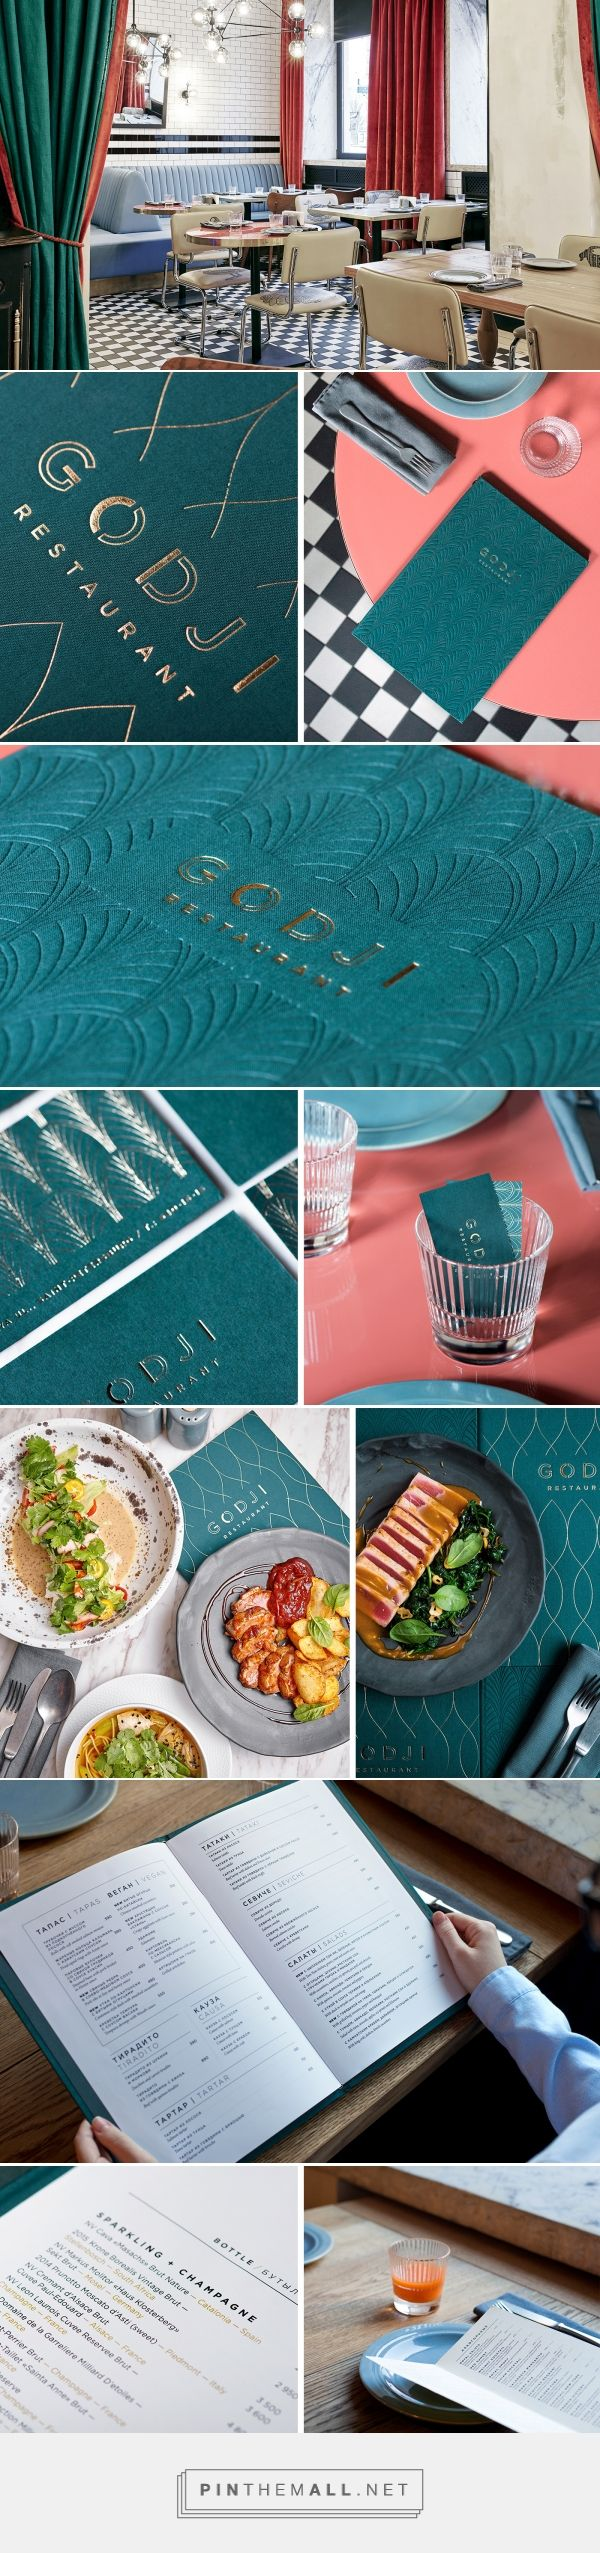 GODJI Restaurant Branding and Menu Design by Taissa Shaim | Fivestar Branding Agency – Design and Branding Agency & Curated Inspiration Gallery